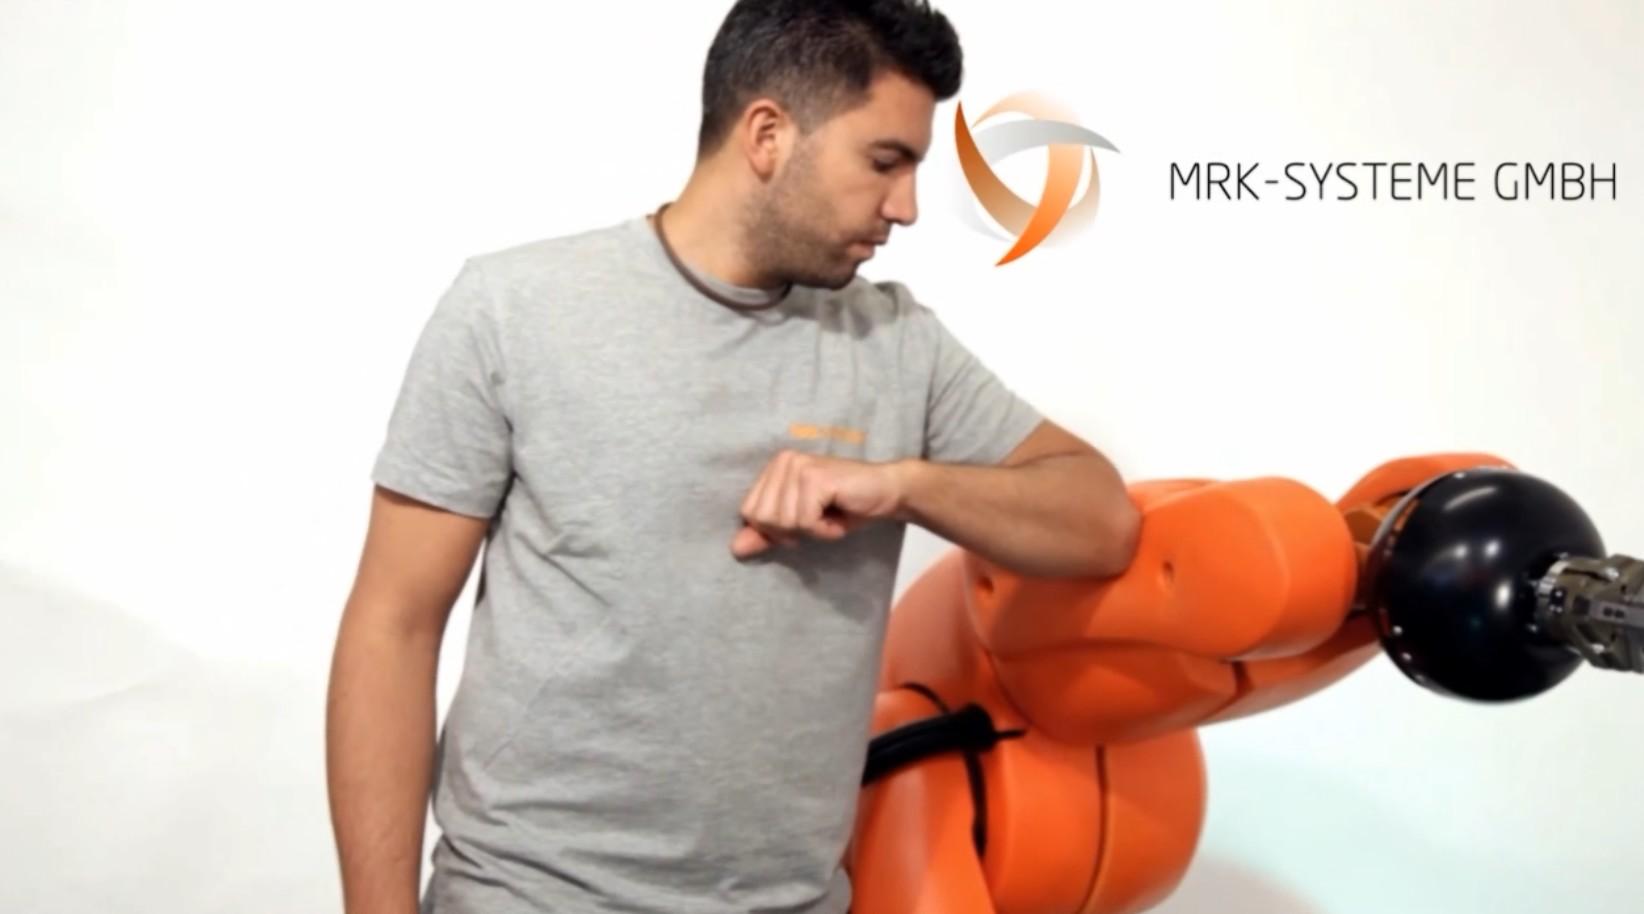 collaborative-robots-sensors-safety-pads-KUKA-KR5 SI